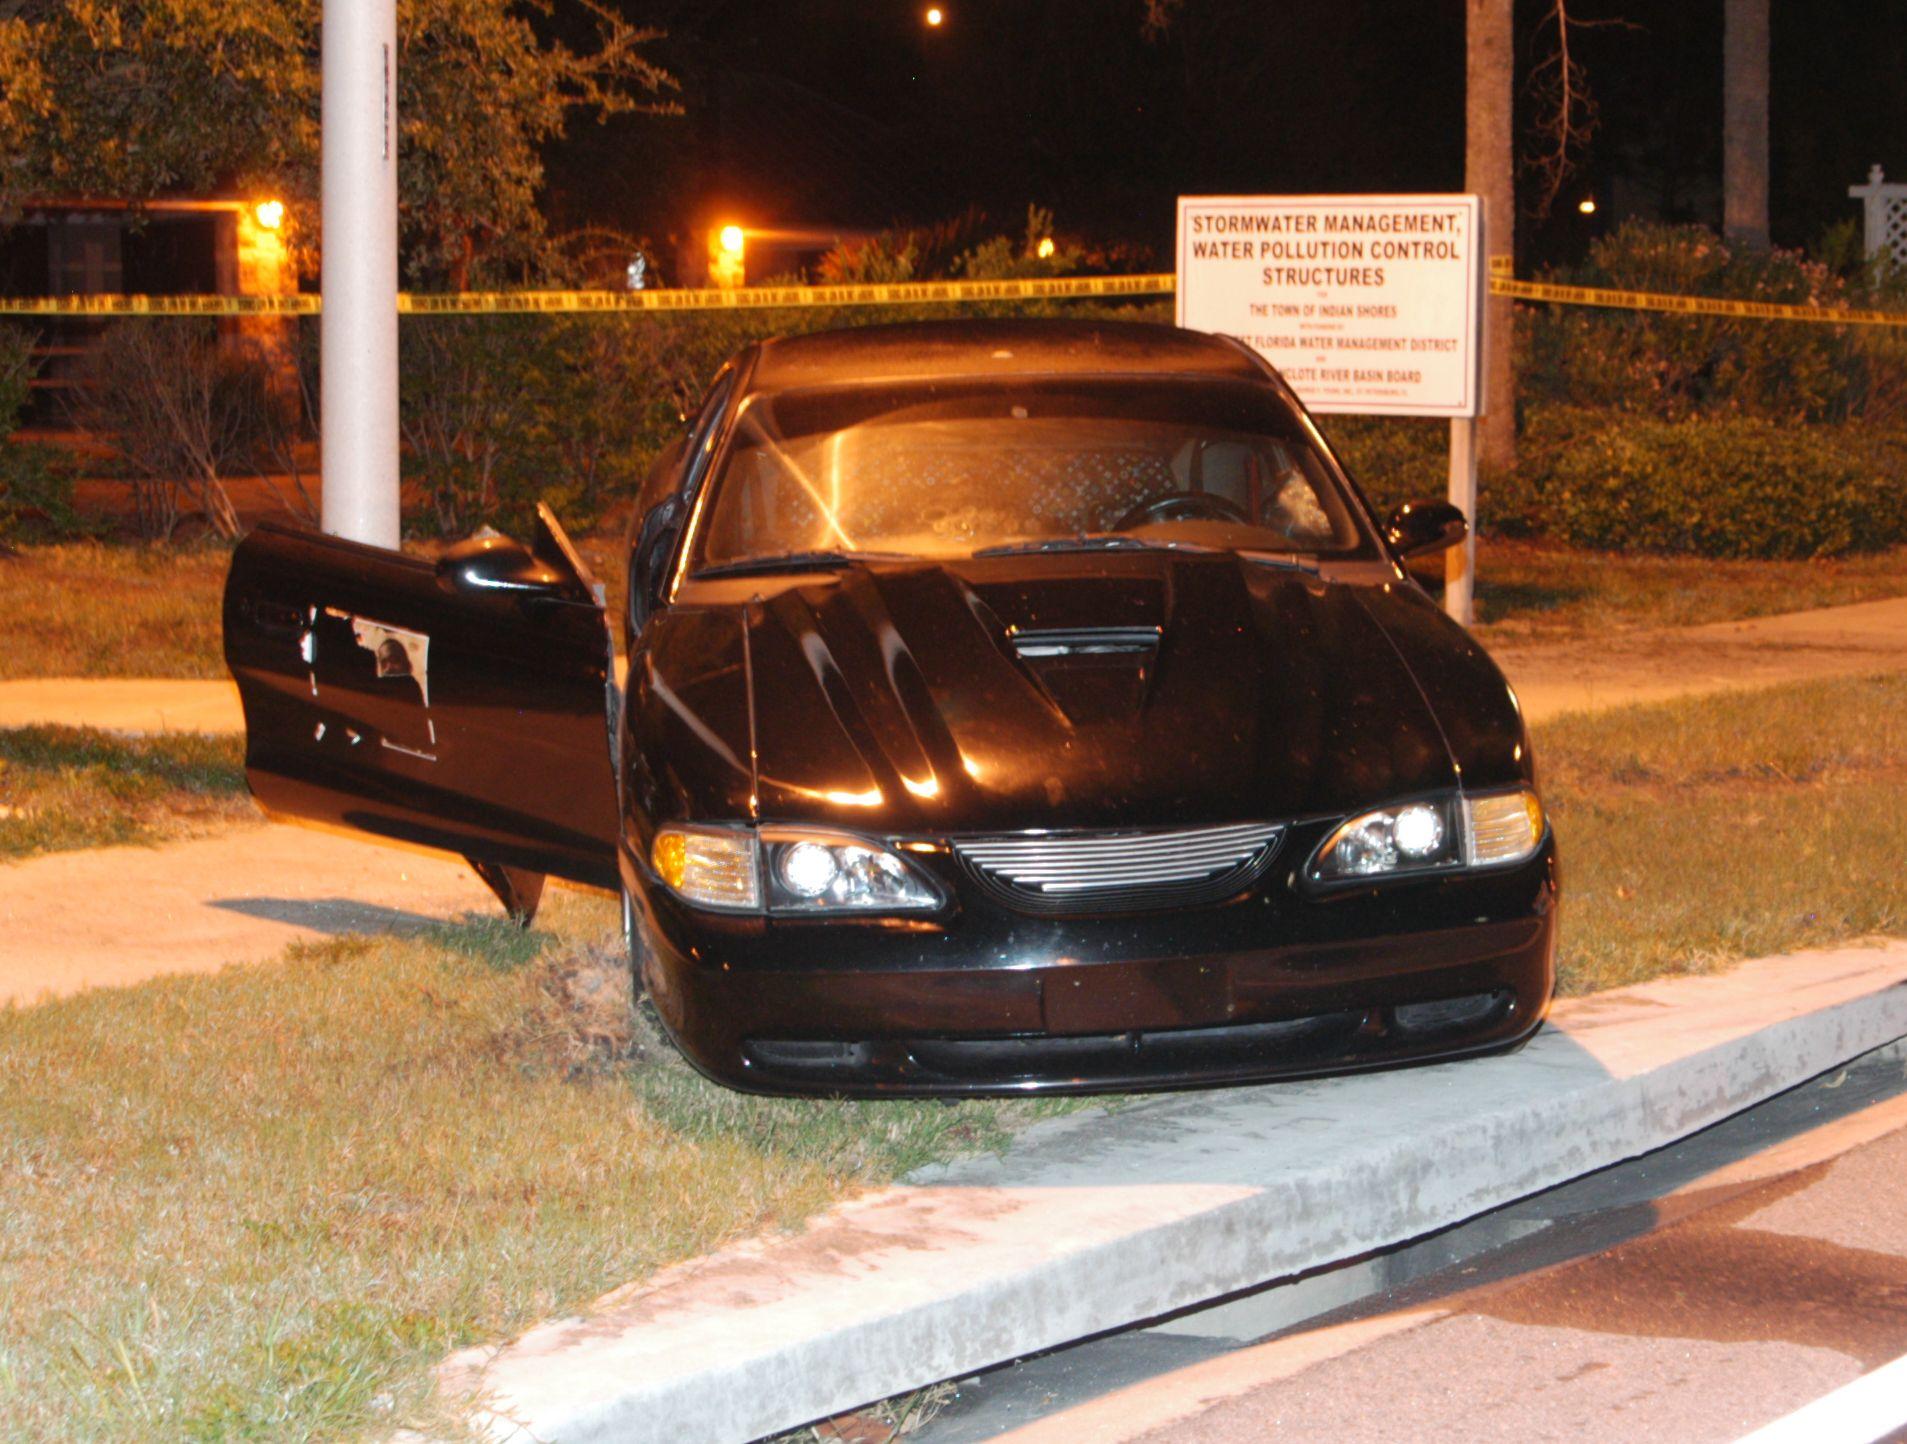 Shots Fired: Pinellas County, Fla., Crime Scene